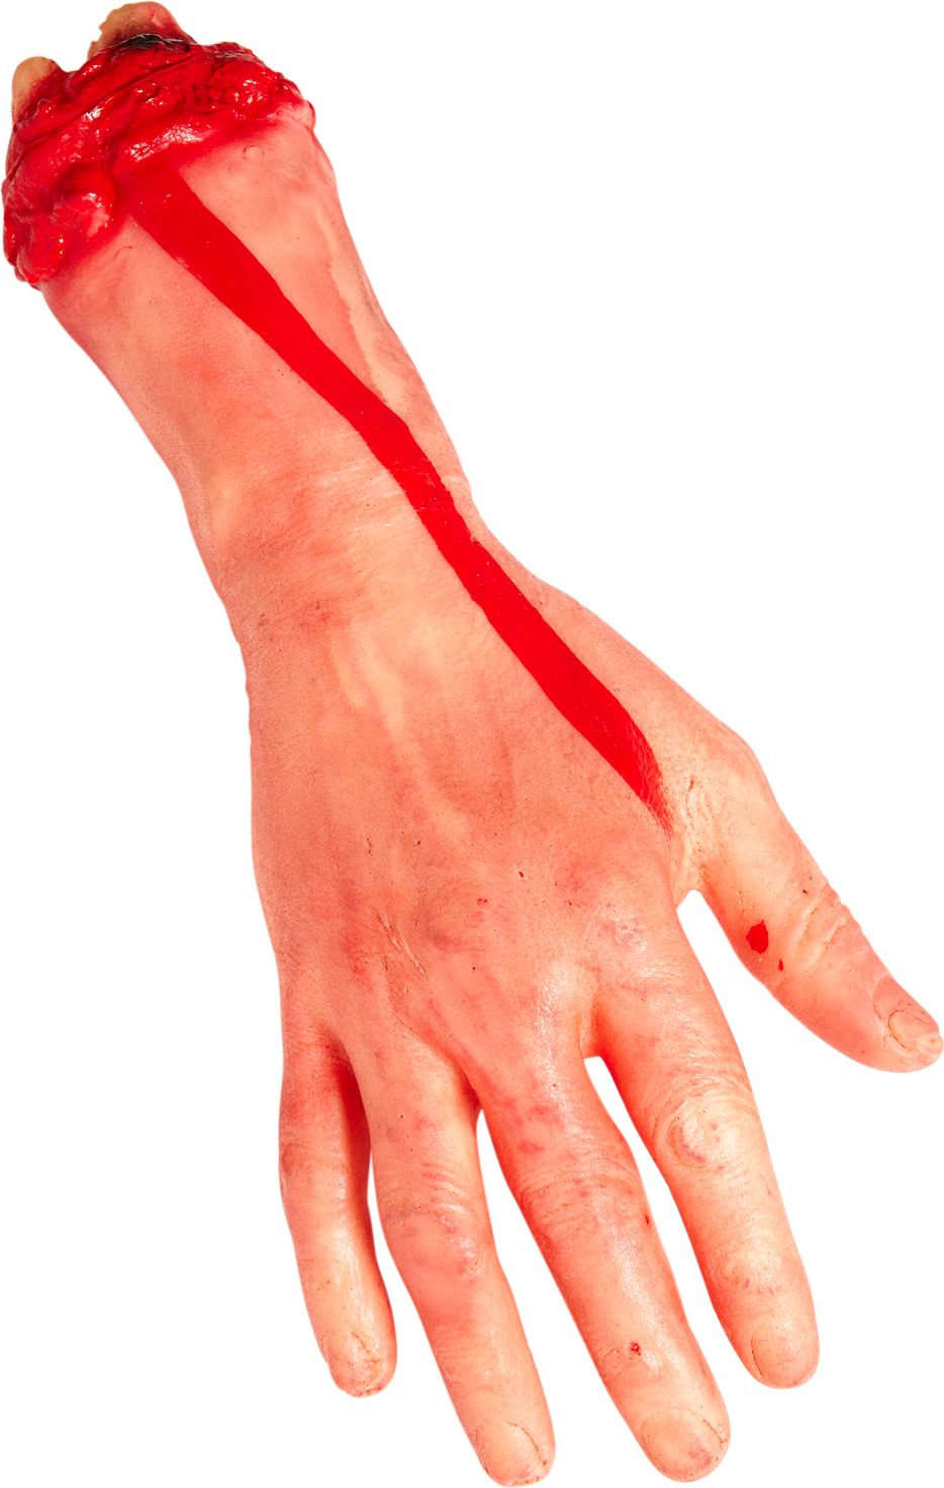 Afgehakte hand